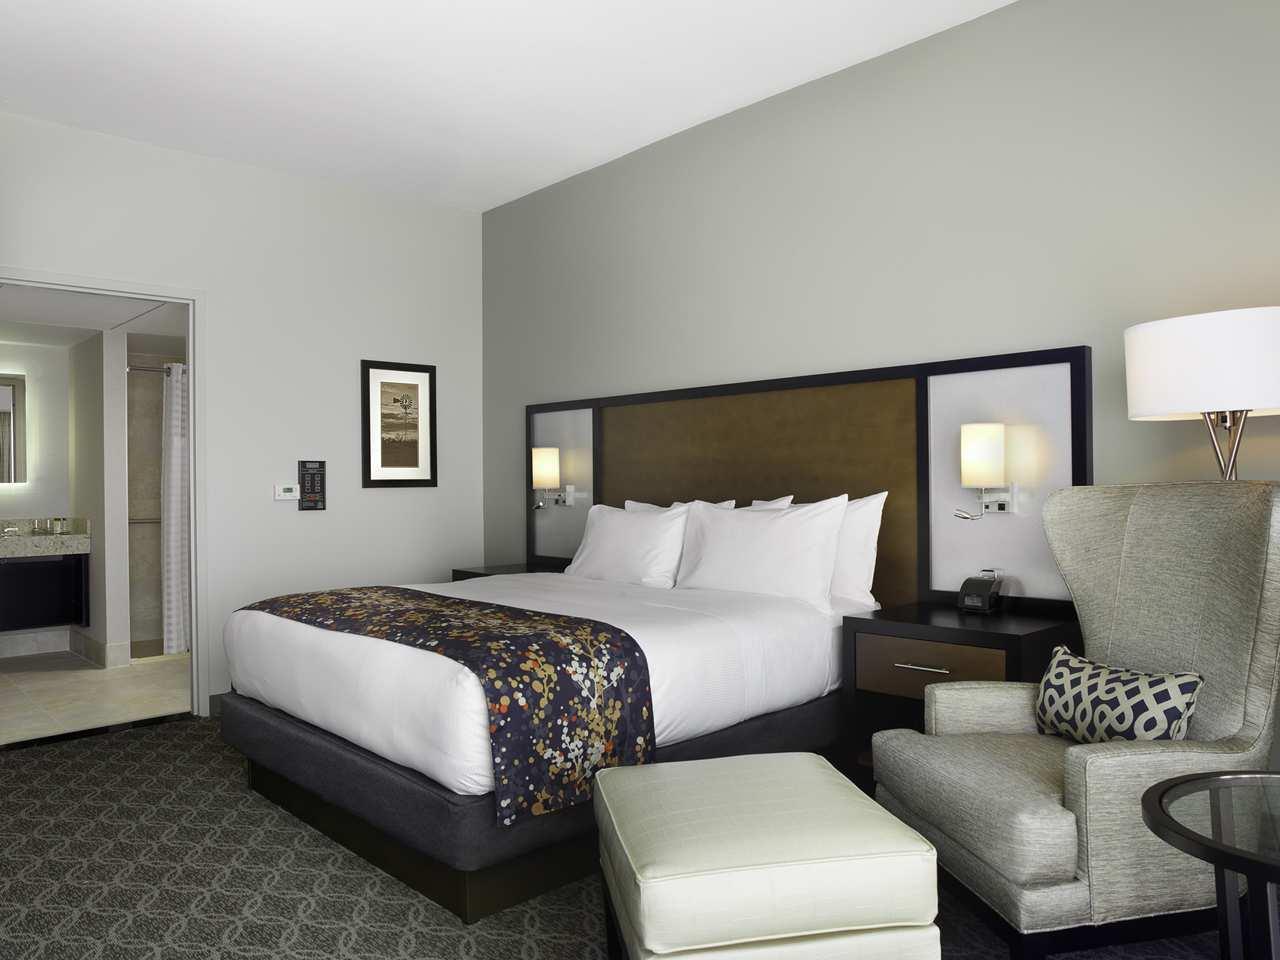 DoubleTree by Hilton Hotel Cedar Rapids Convention Complex image 10